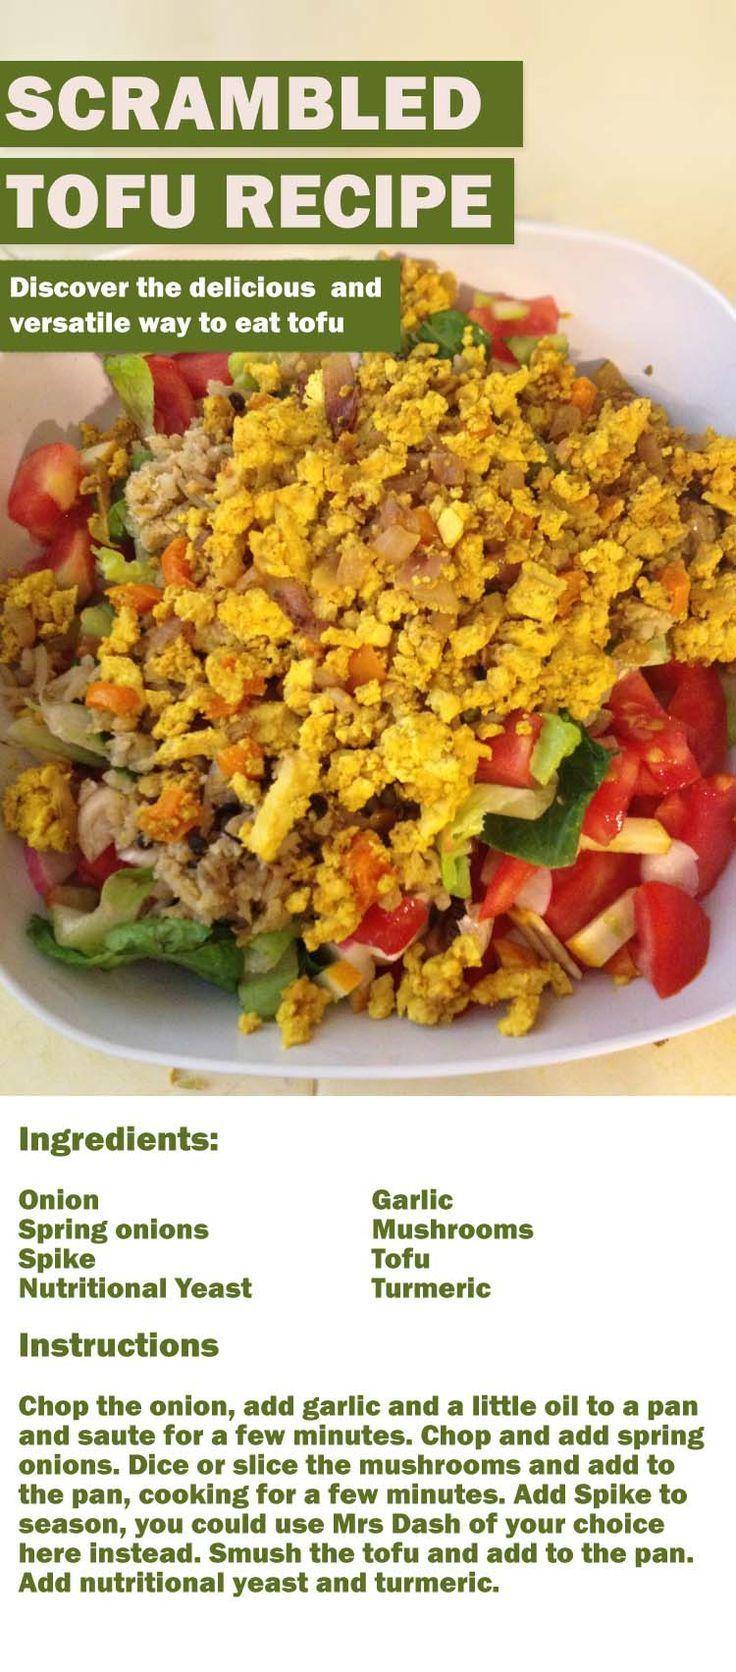 Wondering how to make tofu taste great? Try my scrambled tofu recipe